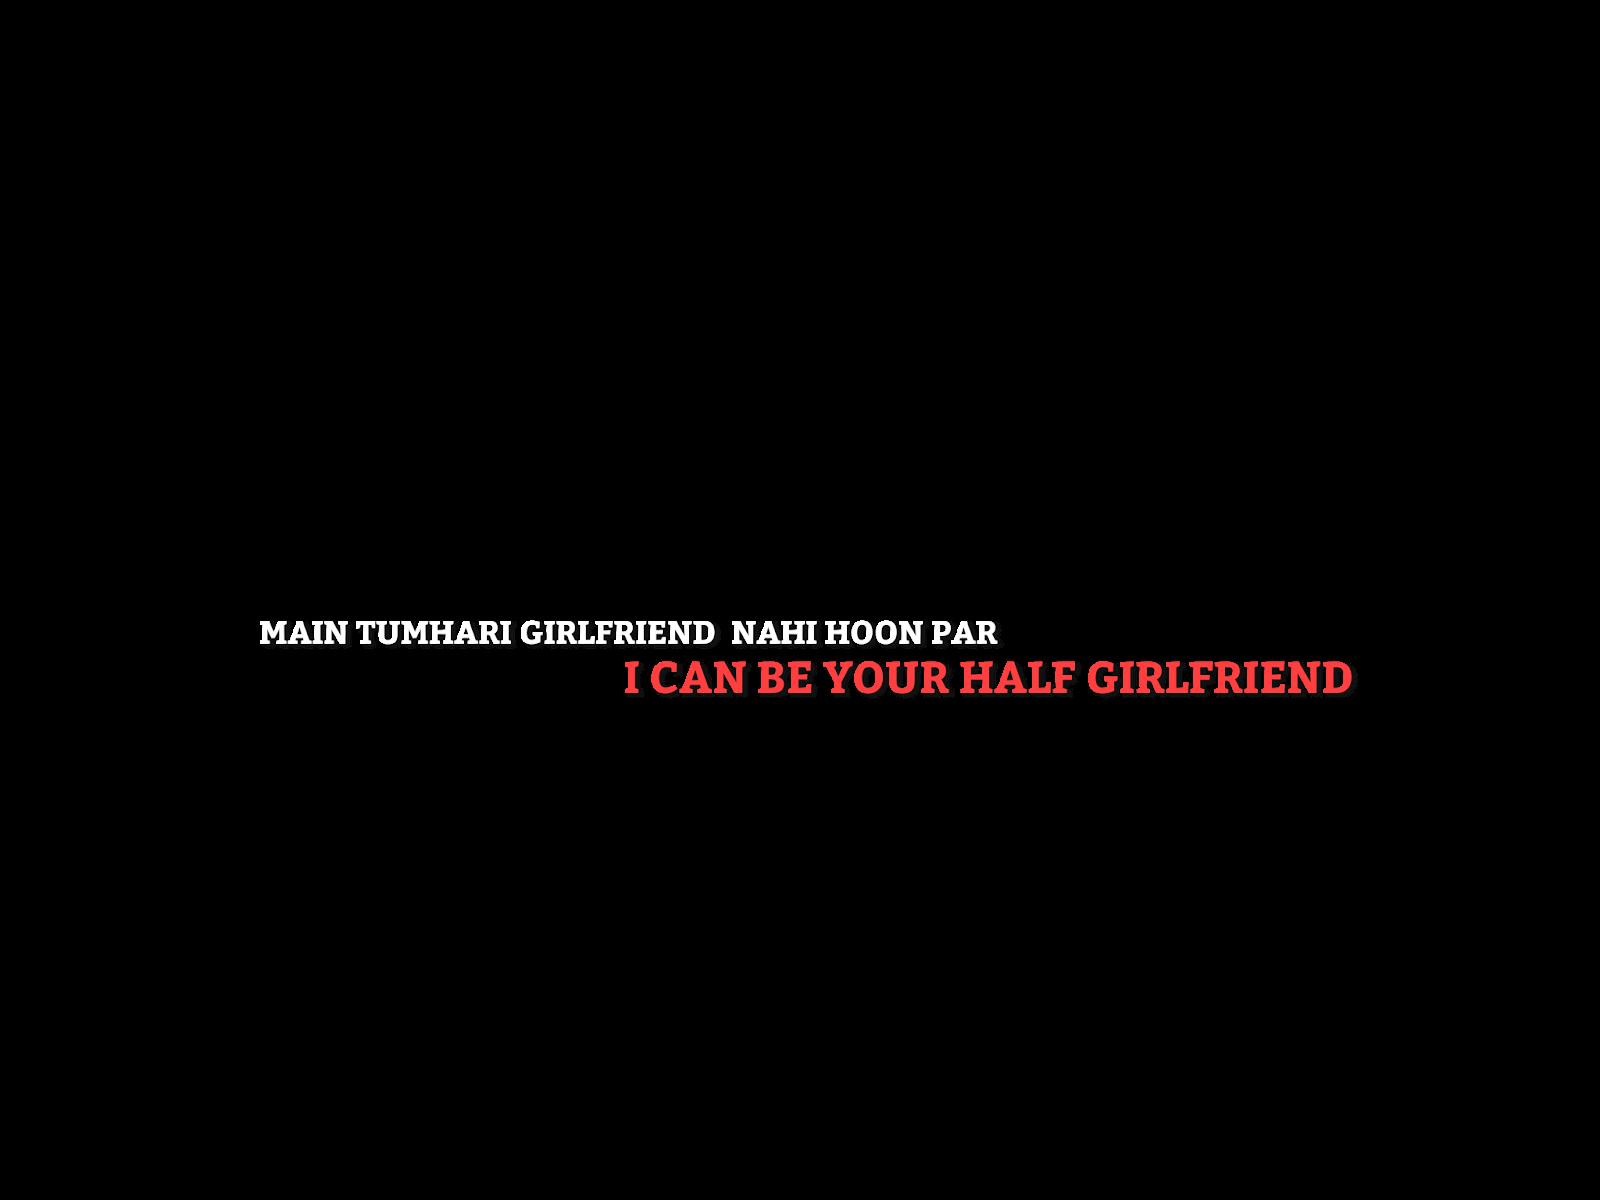 Designer Randhir : ☆ HALF GIRLFRIEND MOVIE TEXT PNG 《《 BY.